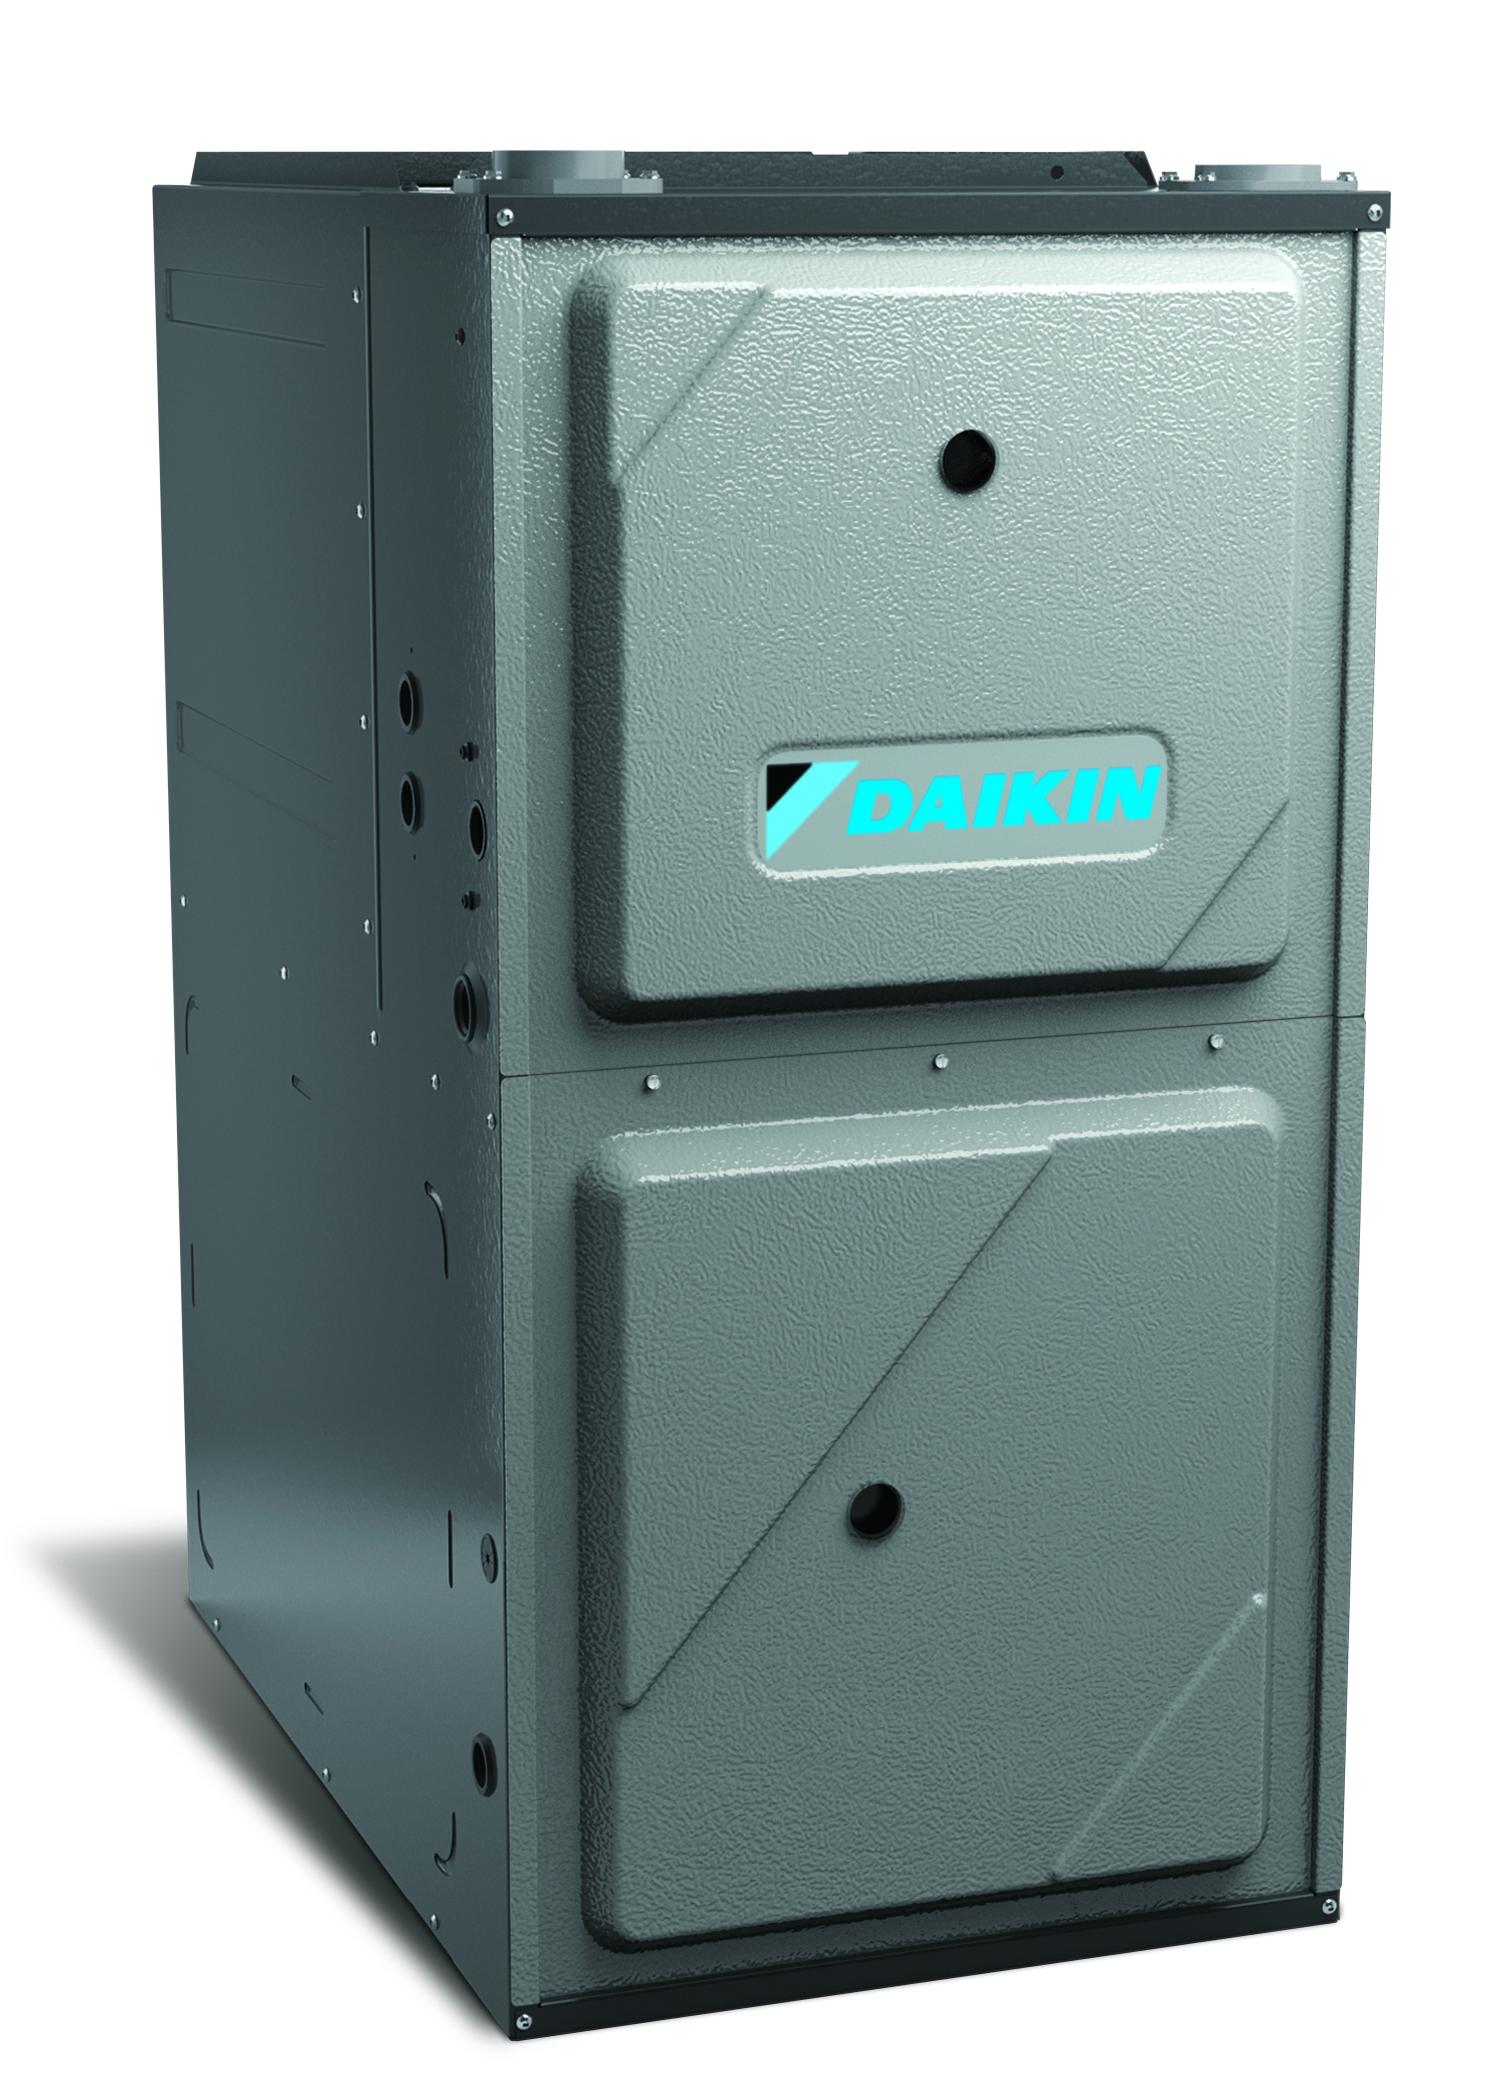 Eci Hvac Llc Heating Ventilation And Air Conditioning